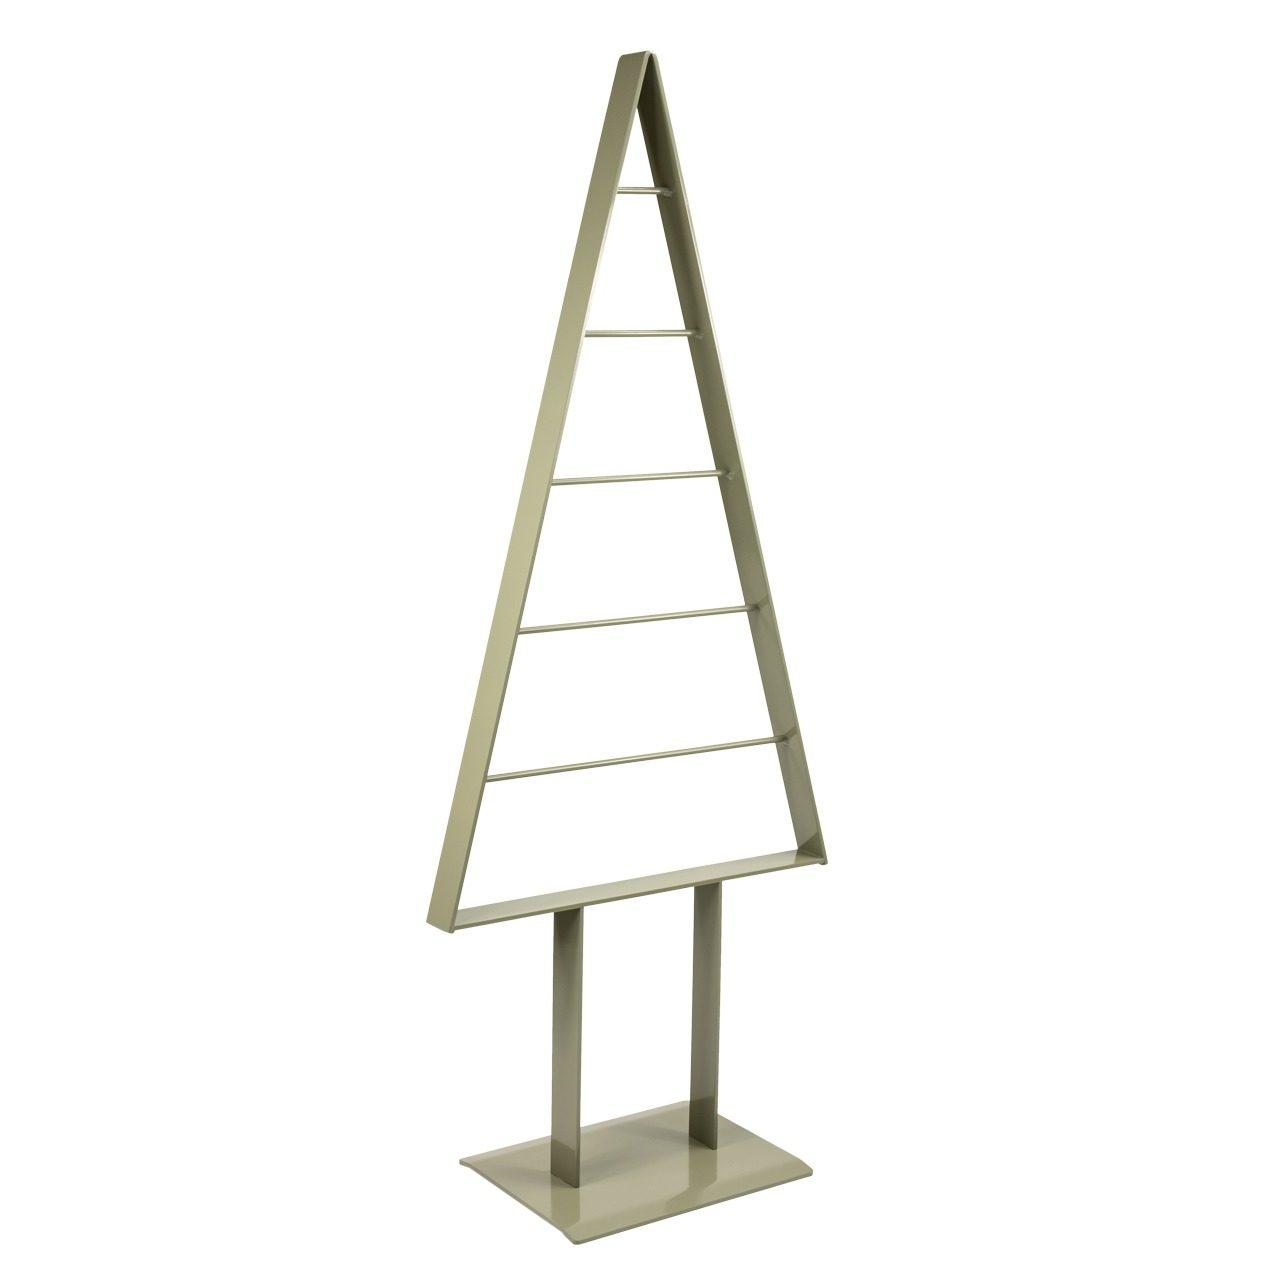 Metall-Weihnachtsbaum (Moosgrau)